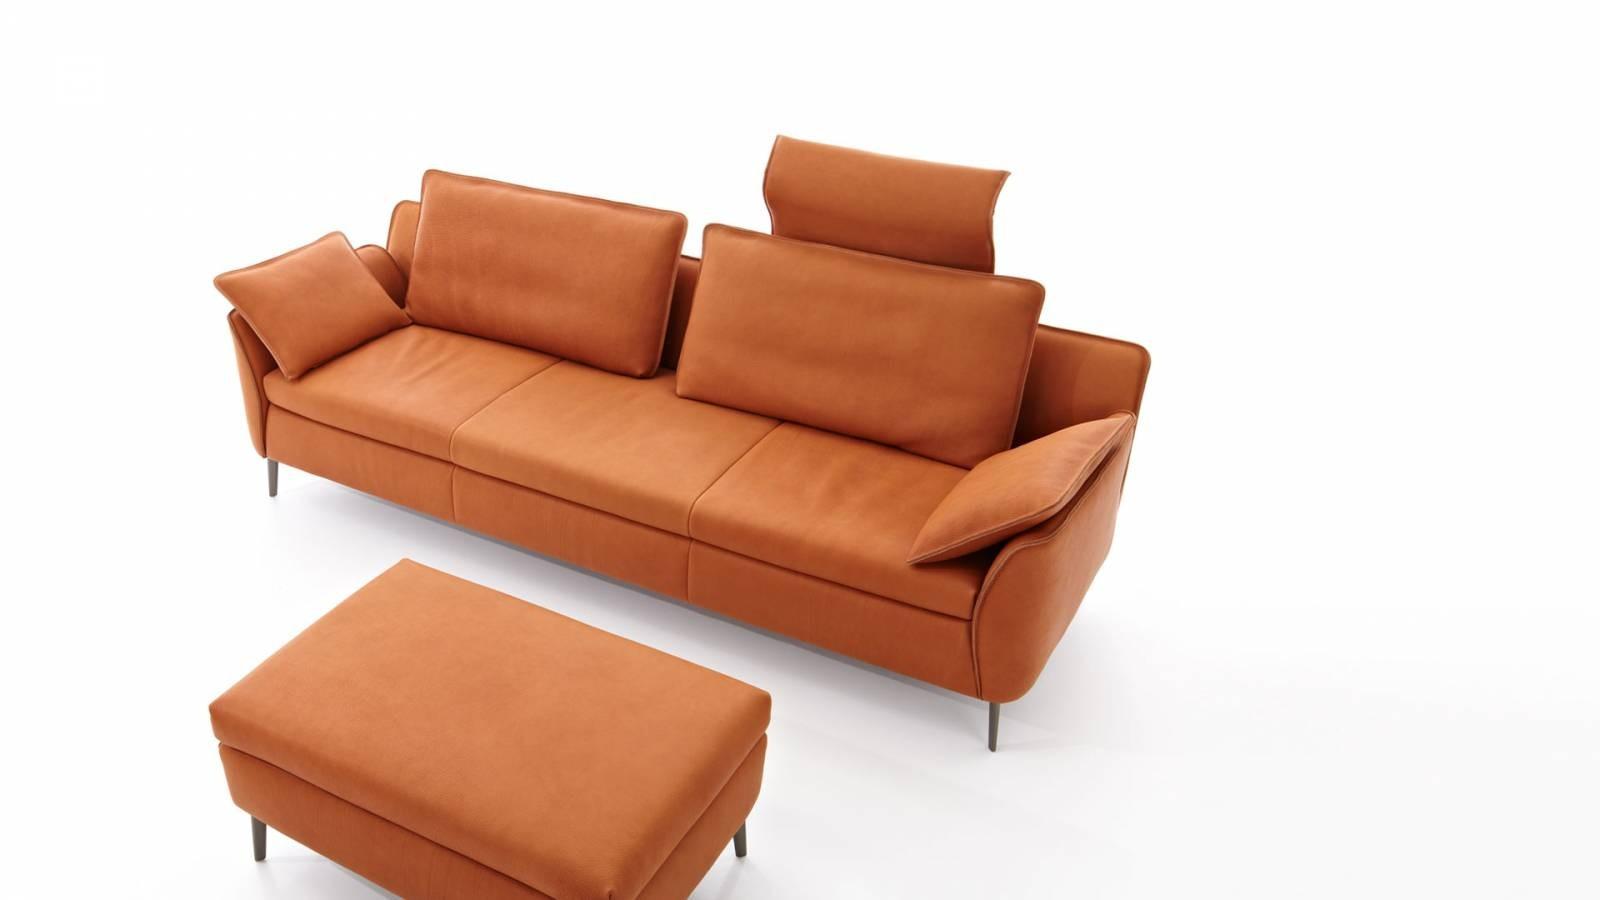 Canapea modernă Koinor Novell